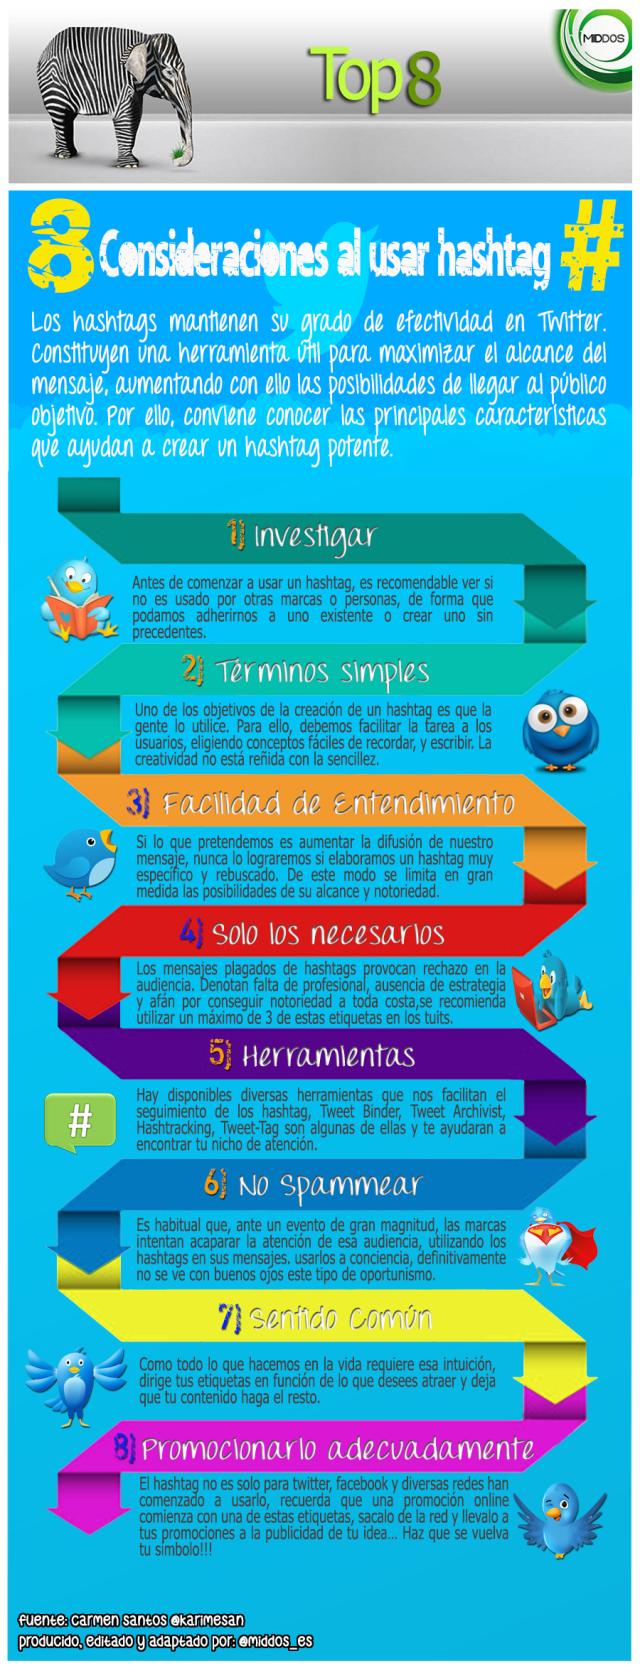 8 consideraciones para usar hashtags